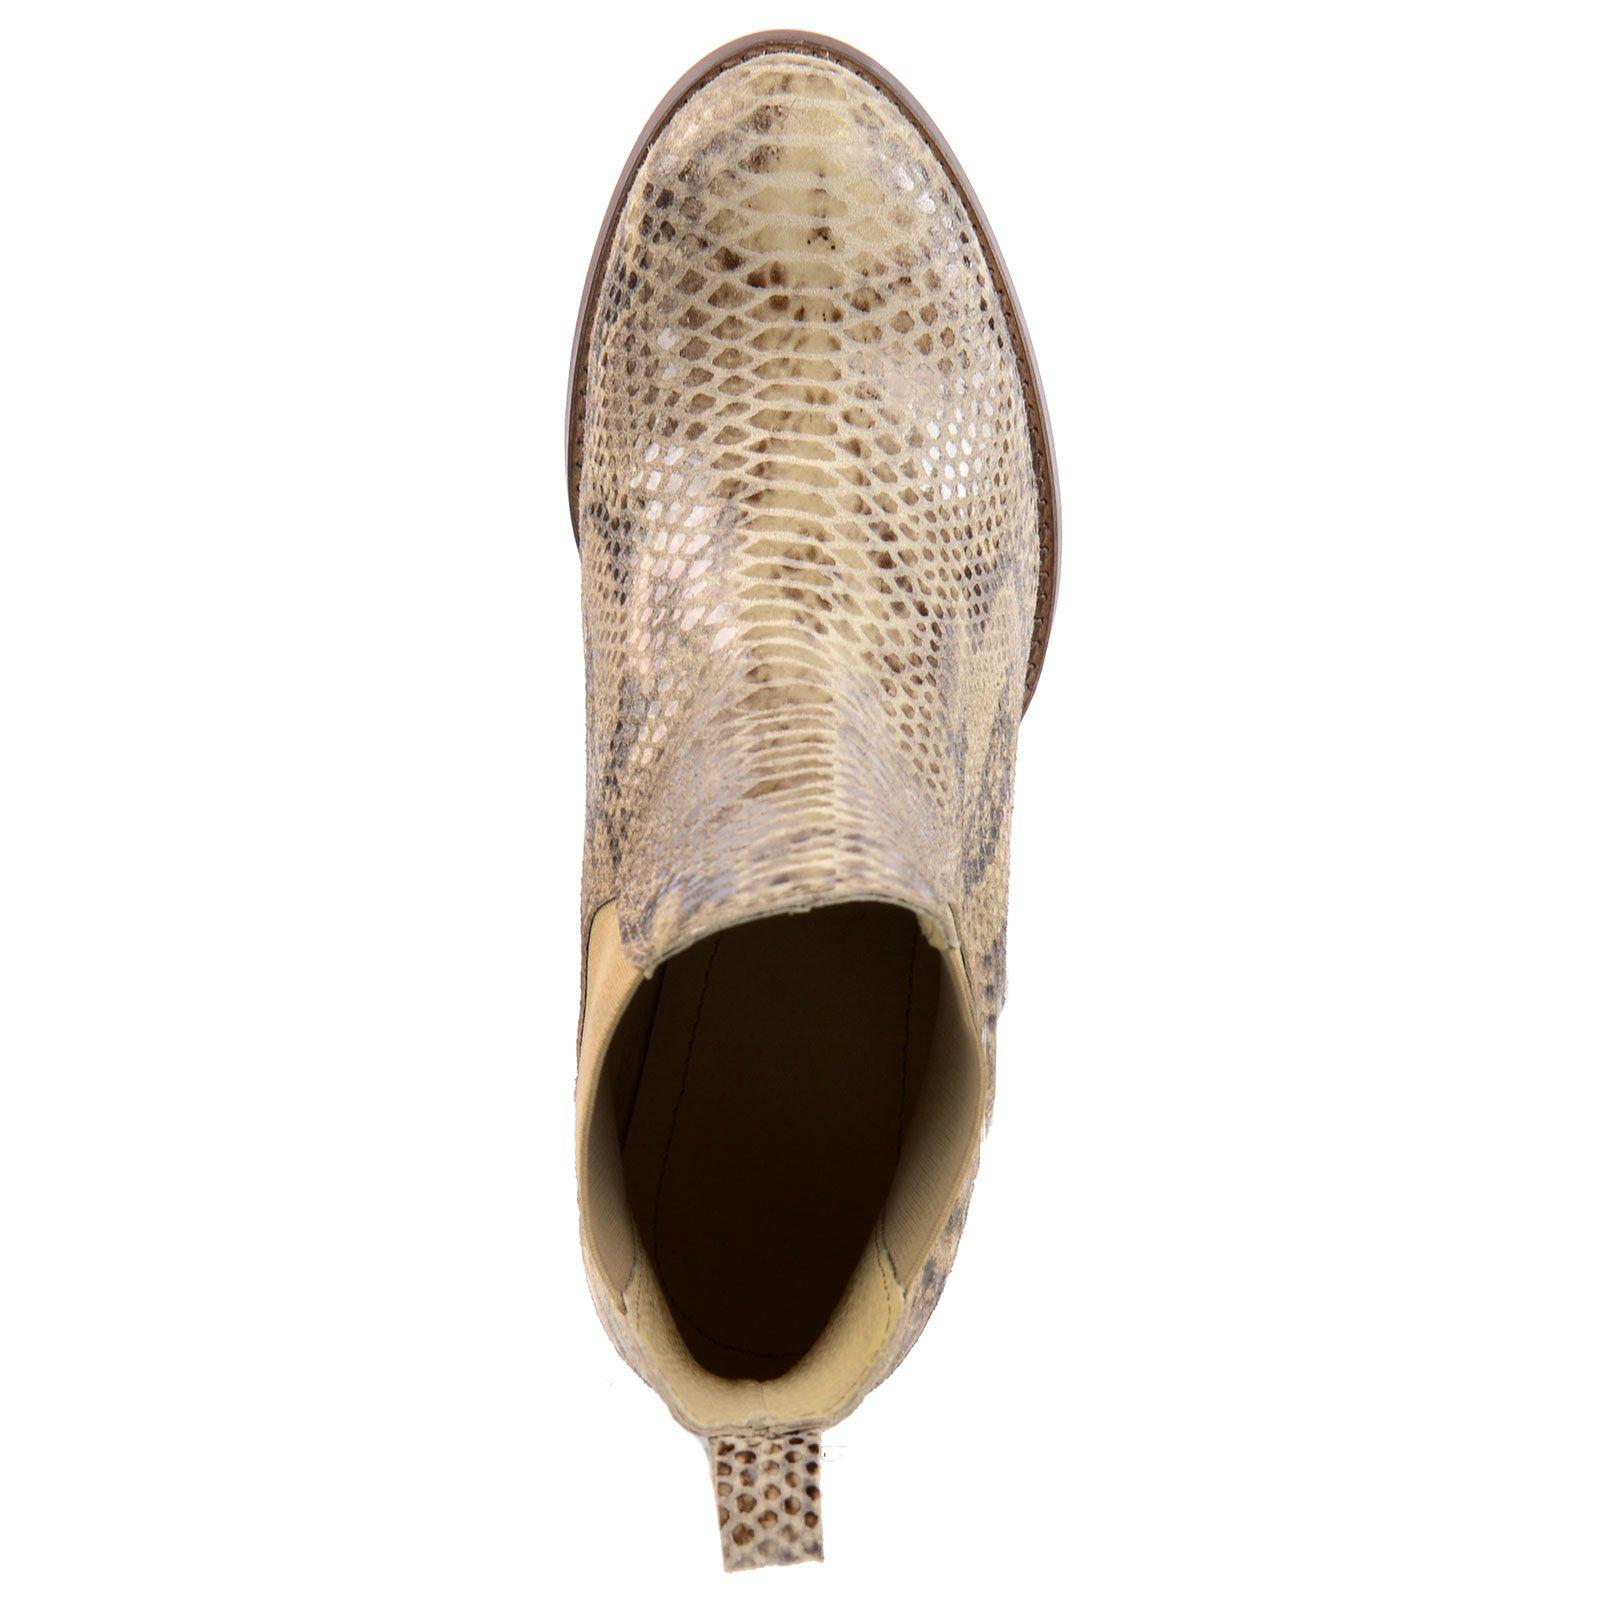 chelsea boots mit blockabsatz snake damenschuhe. Black Bedroom Furniture Sets. Home Design Ideas